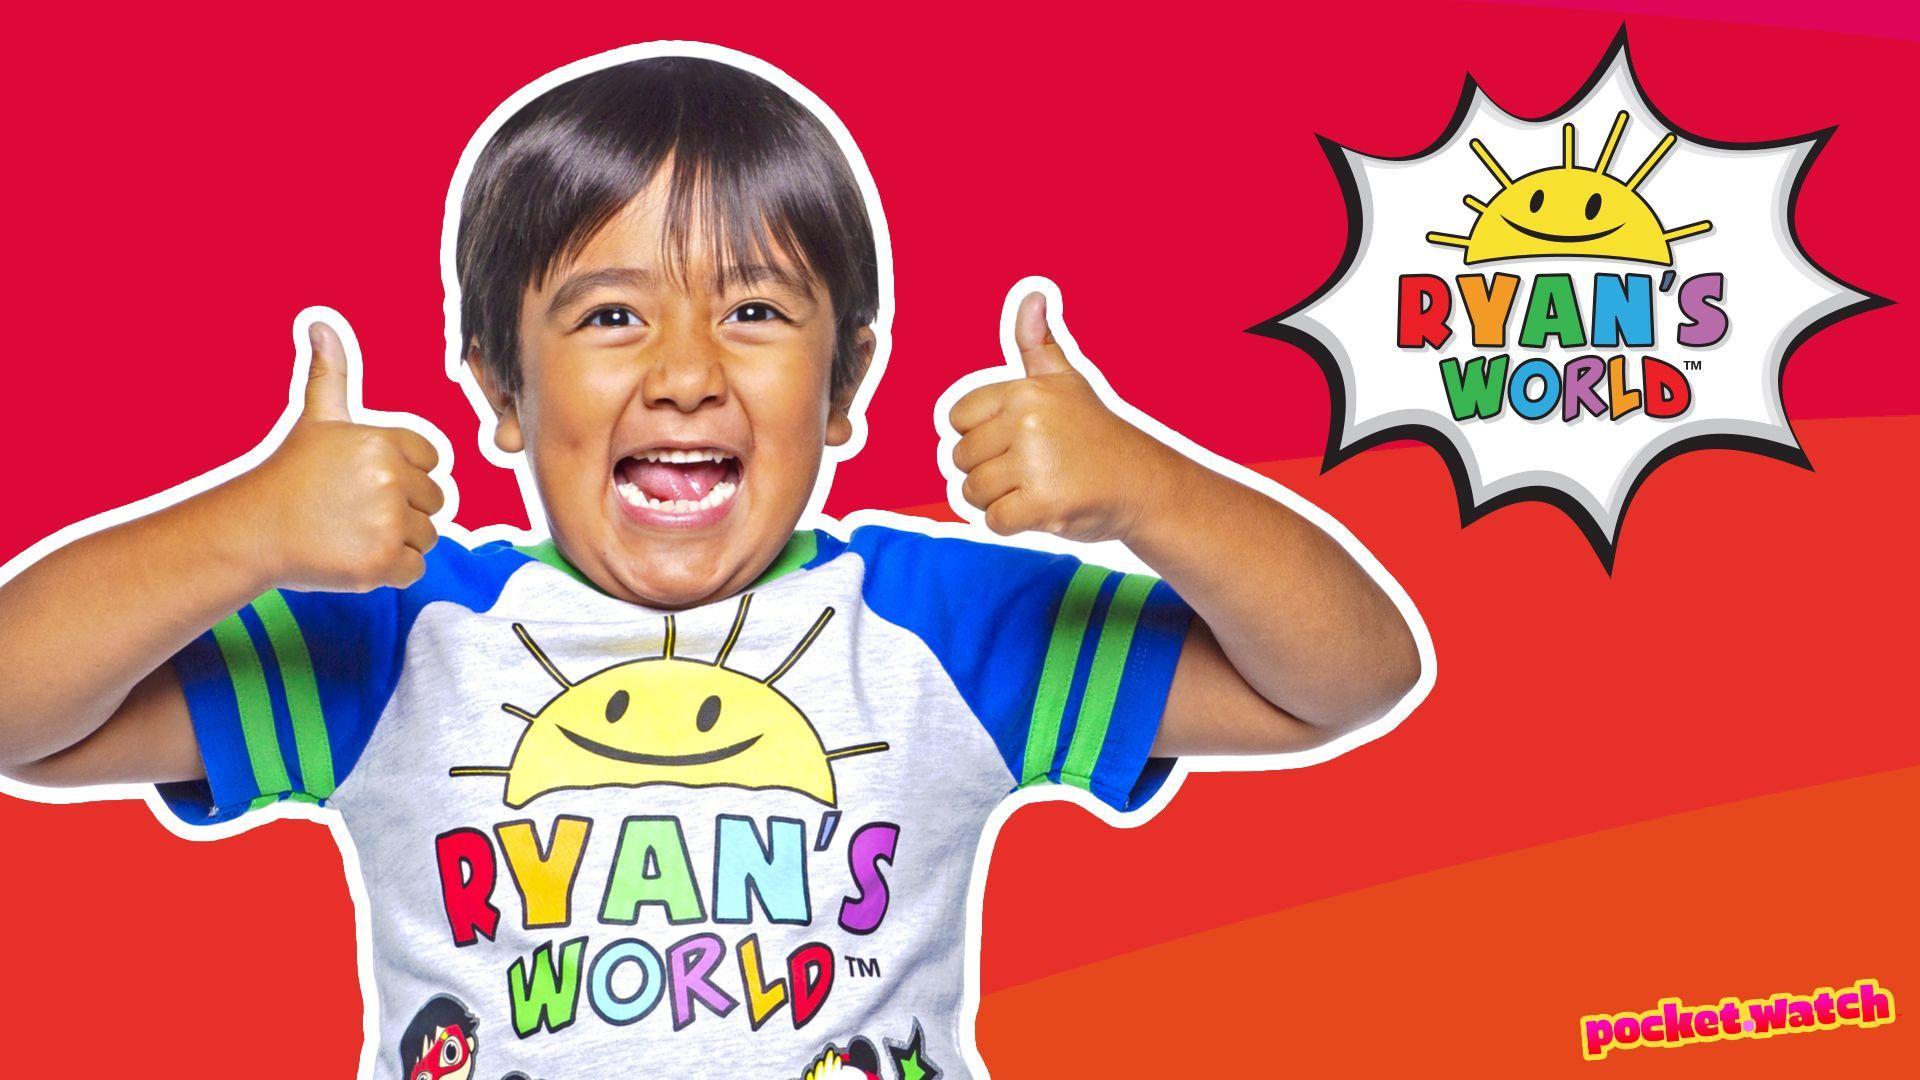 Ryan's World Net Worth, Career, And Controversies